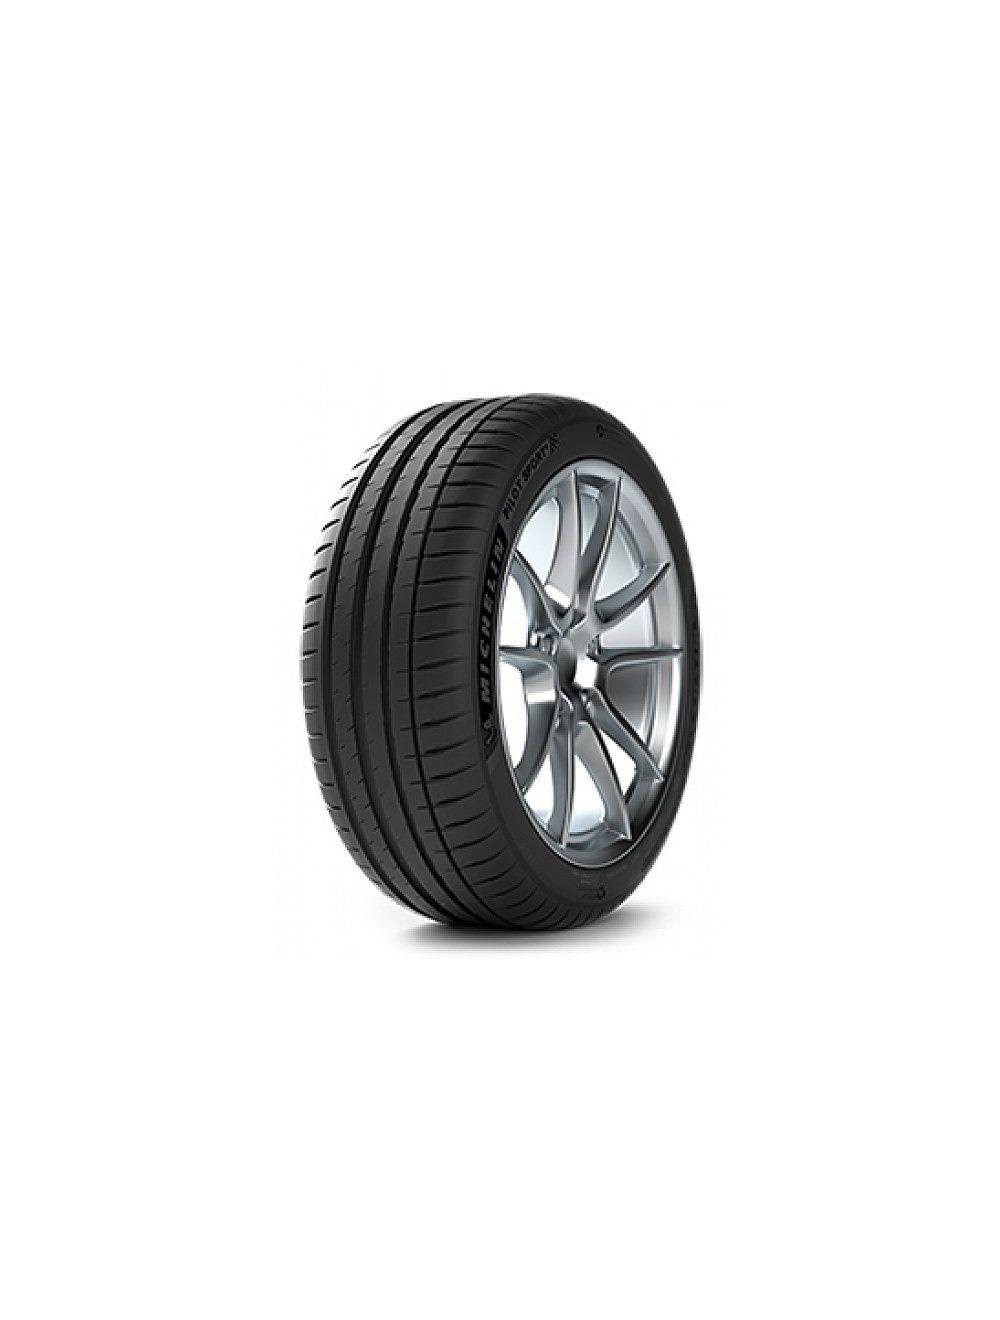 Michelin 215/55R17 Y Pilot Sport 4 XL Nyári gumi